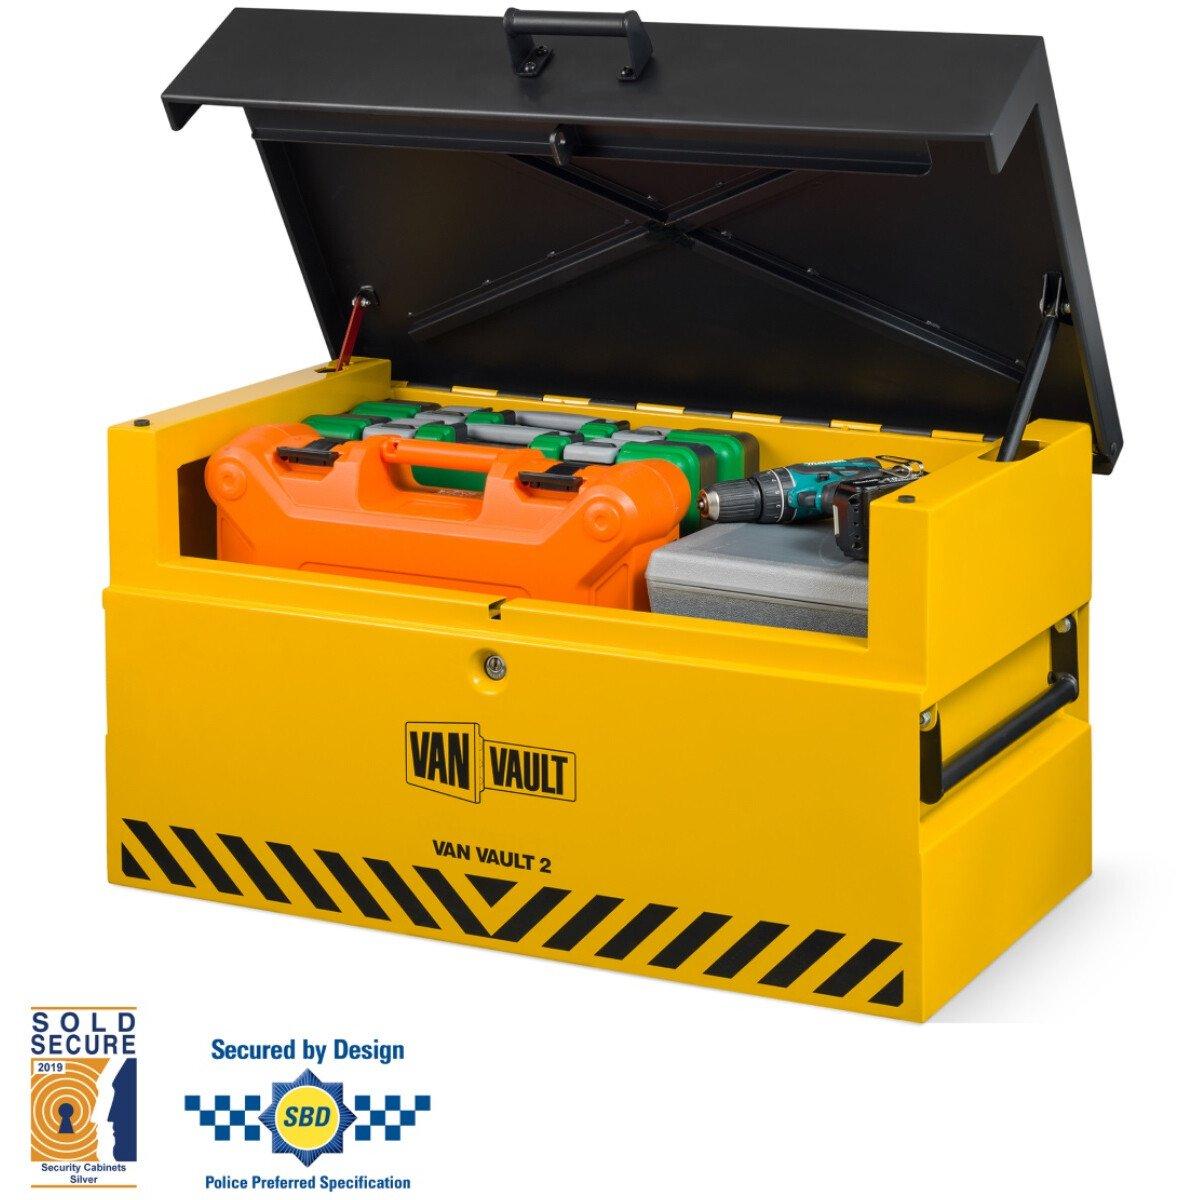 Lawson-HIS Van Vault 2 Storage Chest for Vehicles